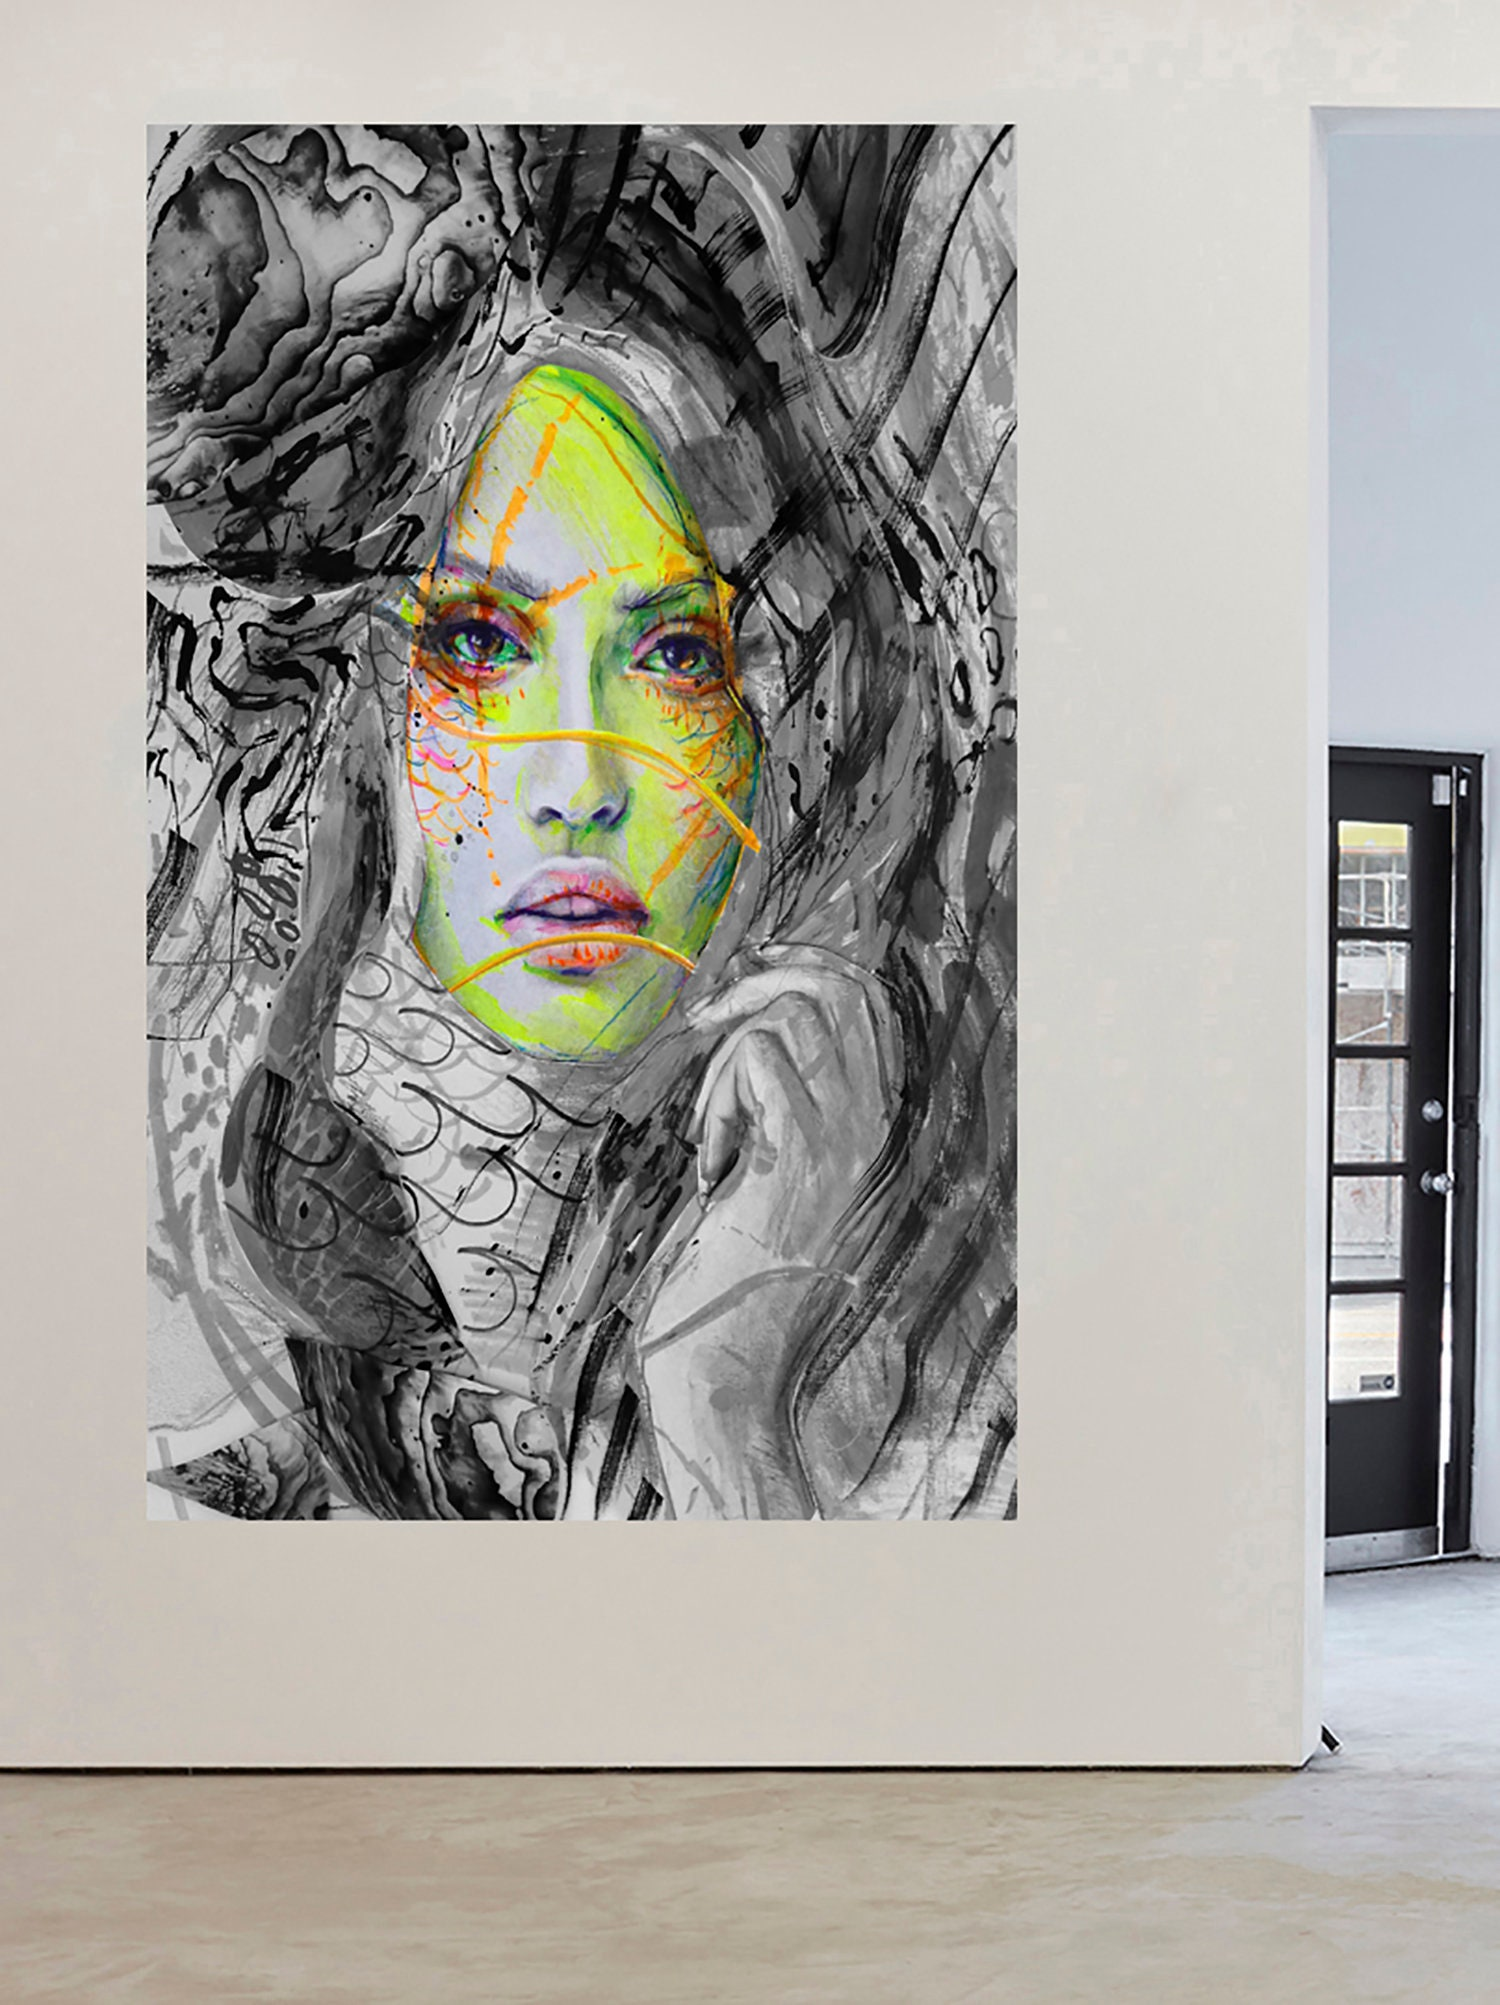 Art  Painting Street Canvas Urban Princess Girl Face framed hand painted